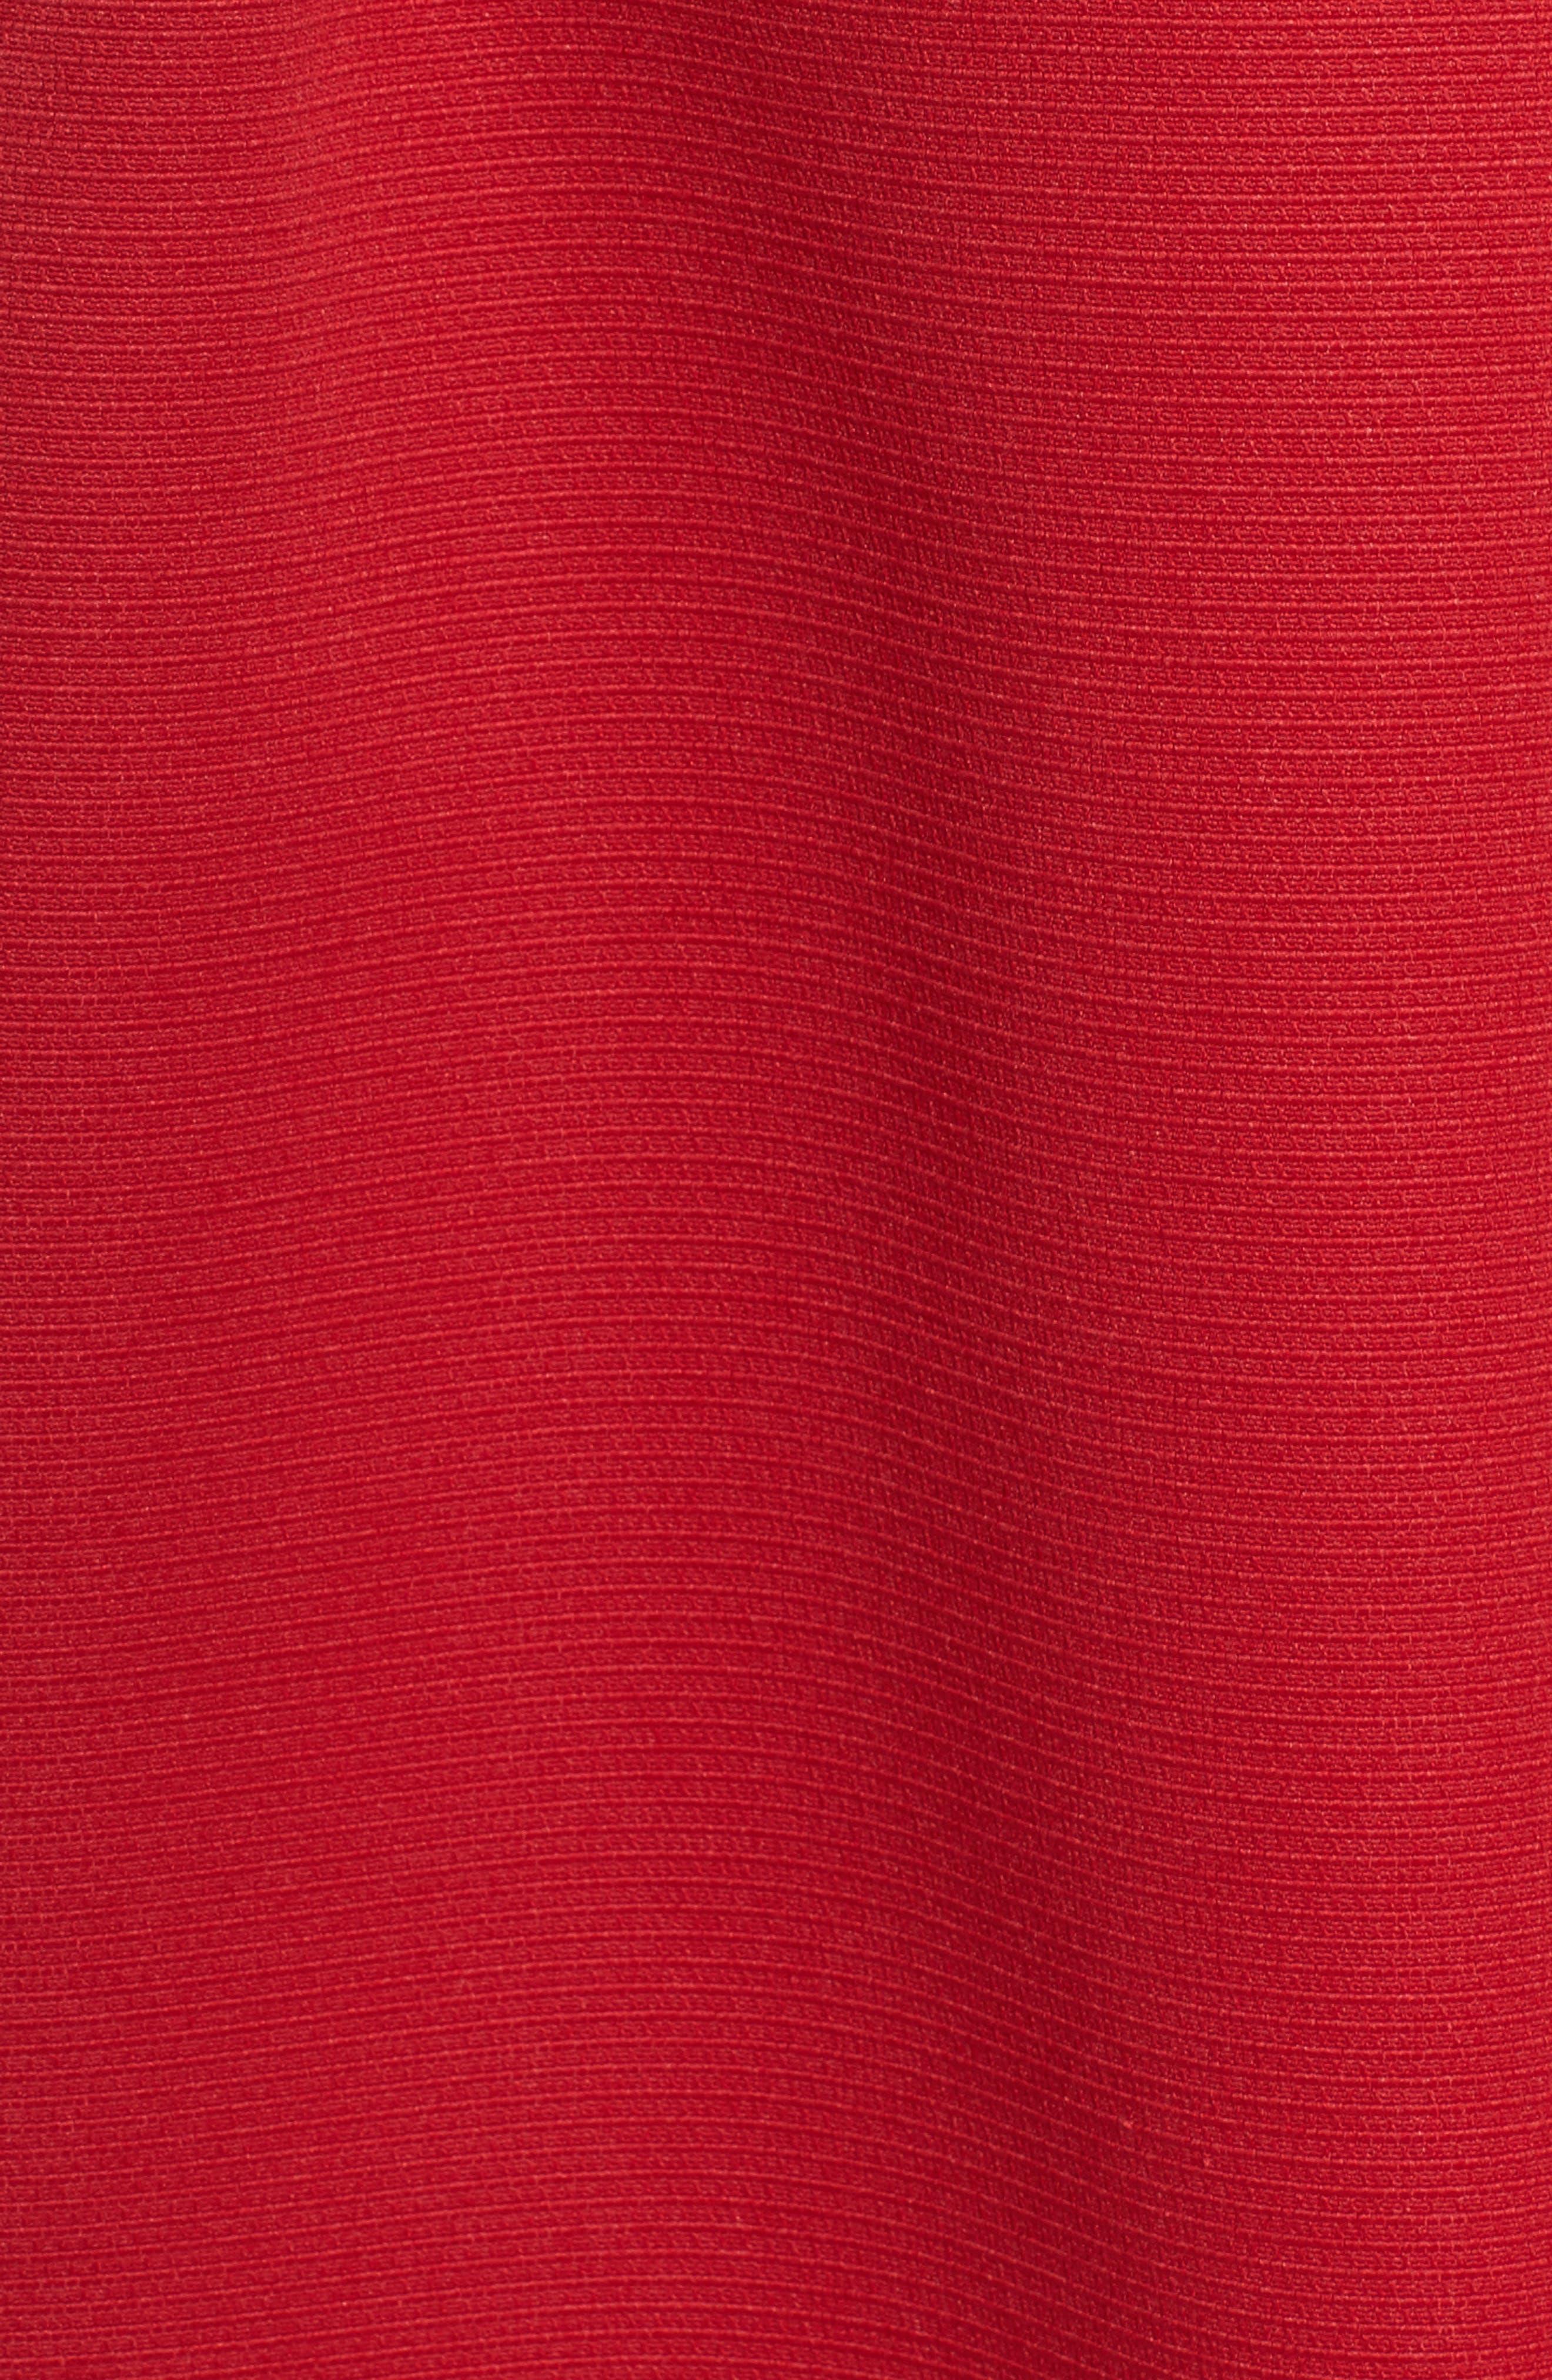 Bow Front A-Line Dress,                             Alternate thumbnail 7, color,